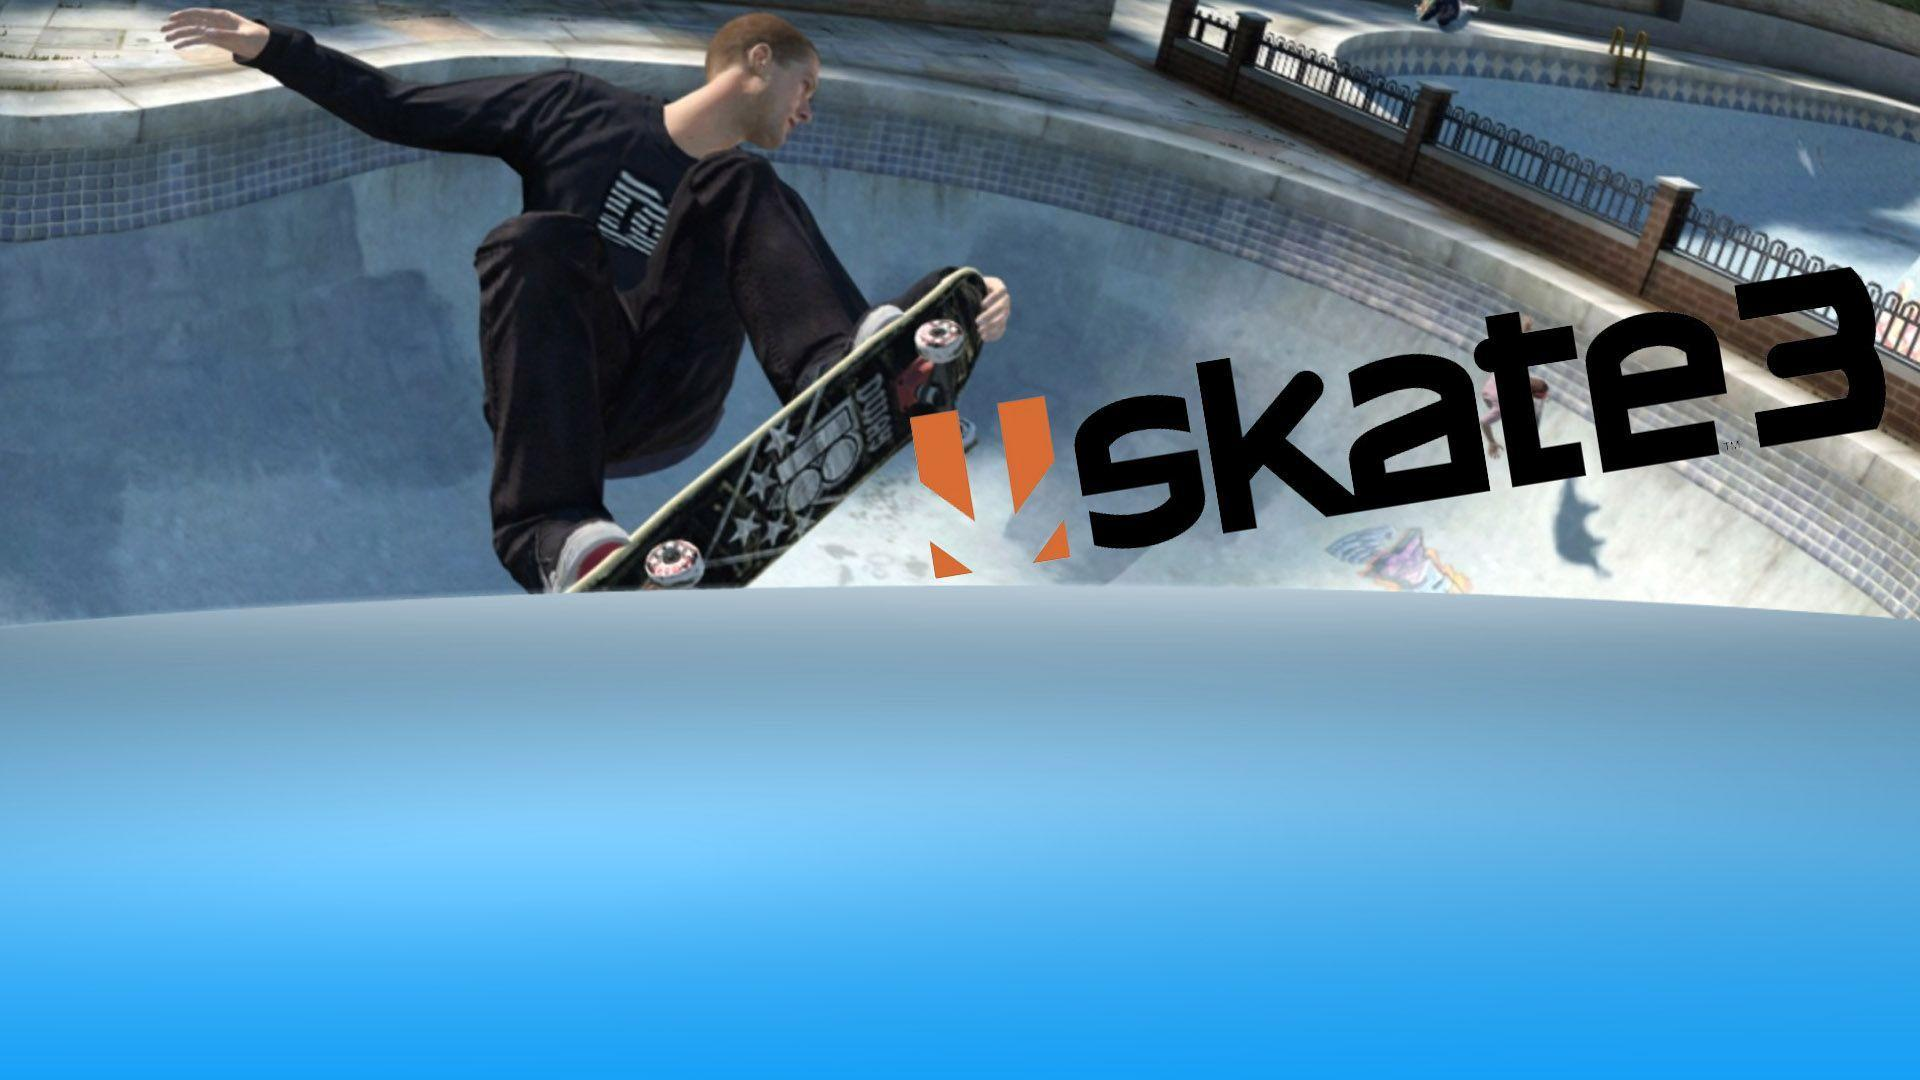 Skateboard Games For Xbox